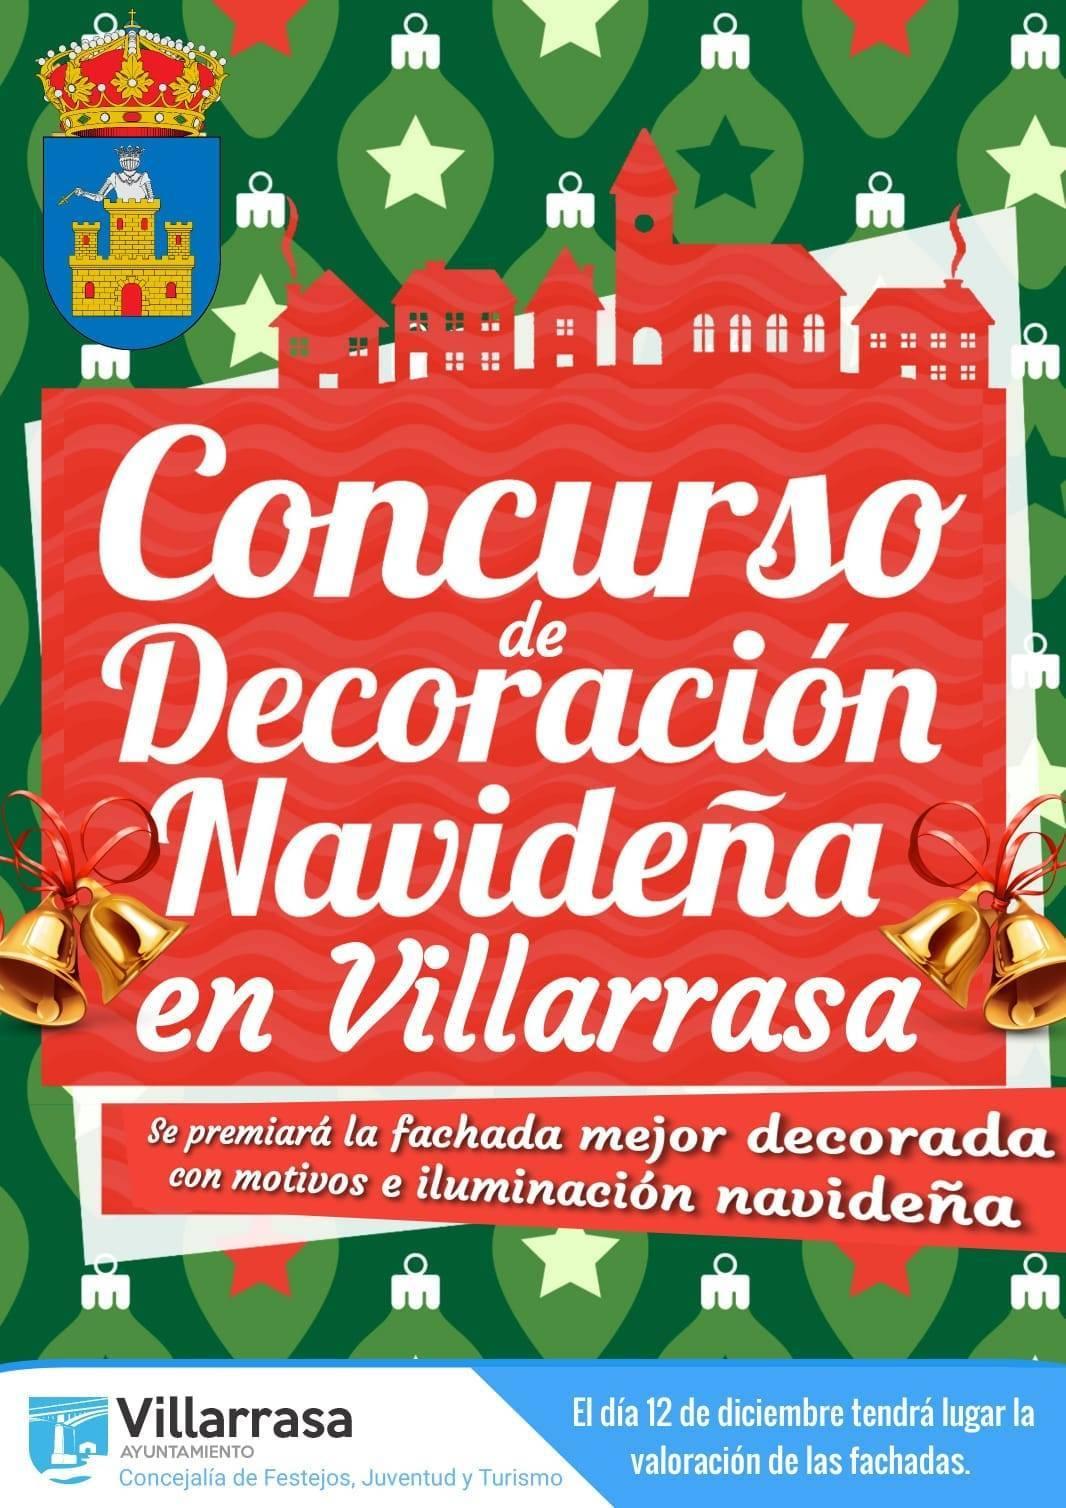 Concurso de decoración navideña (2020) - Villarrasa (Huelva)